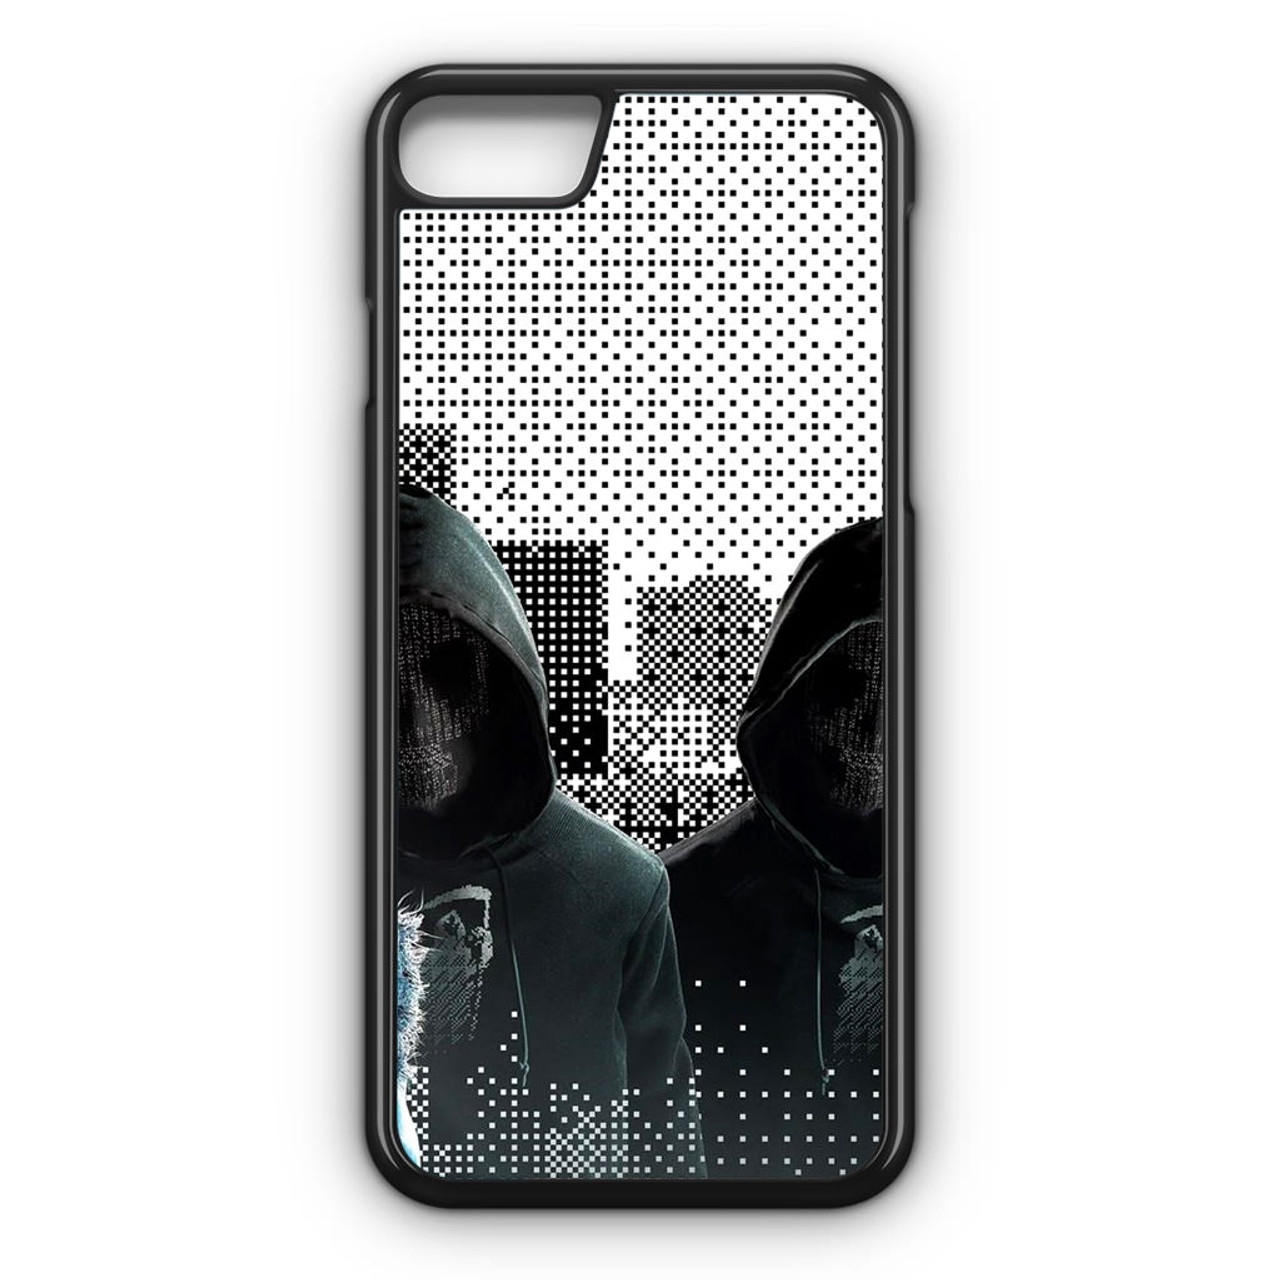 wo zu kaufen größte Auswahl an modische Muster Watch Dogs 2 Mask iPhone 7 Case